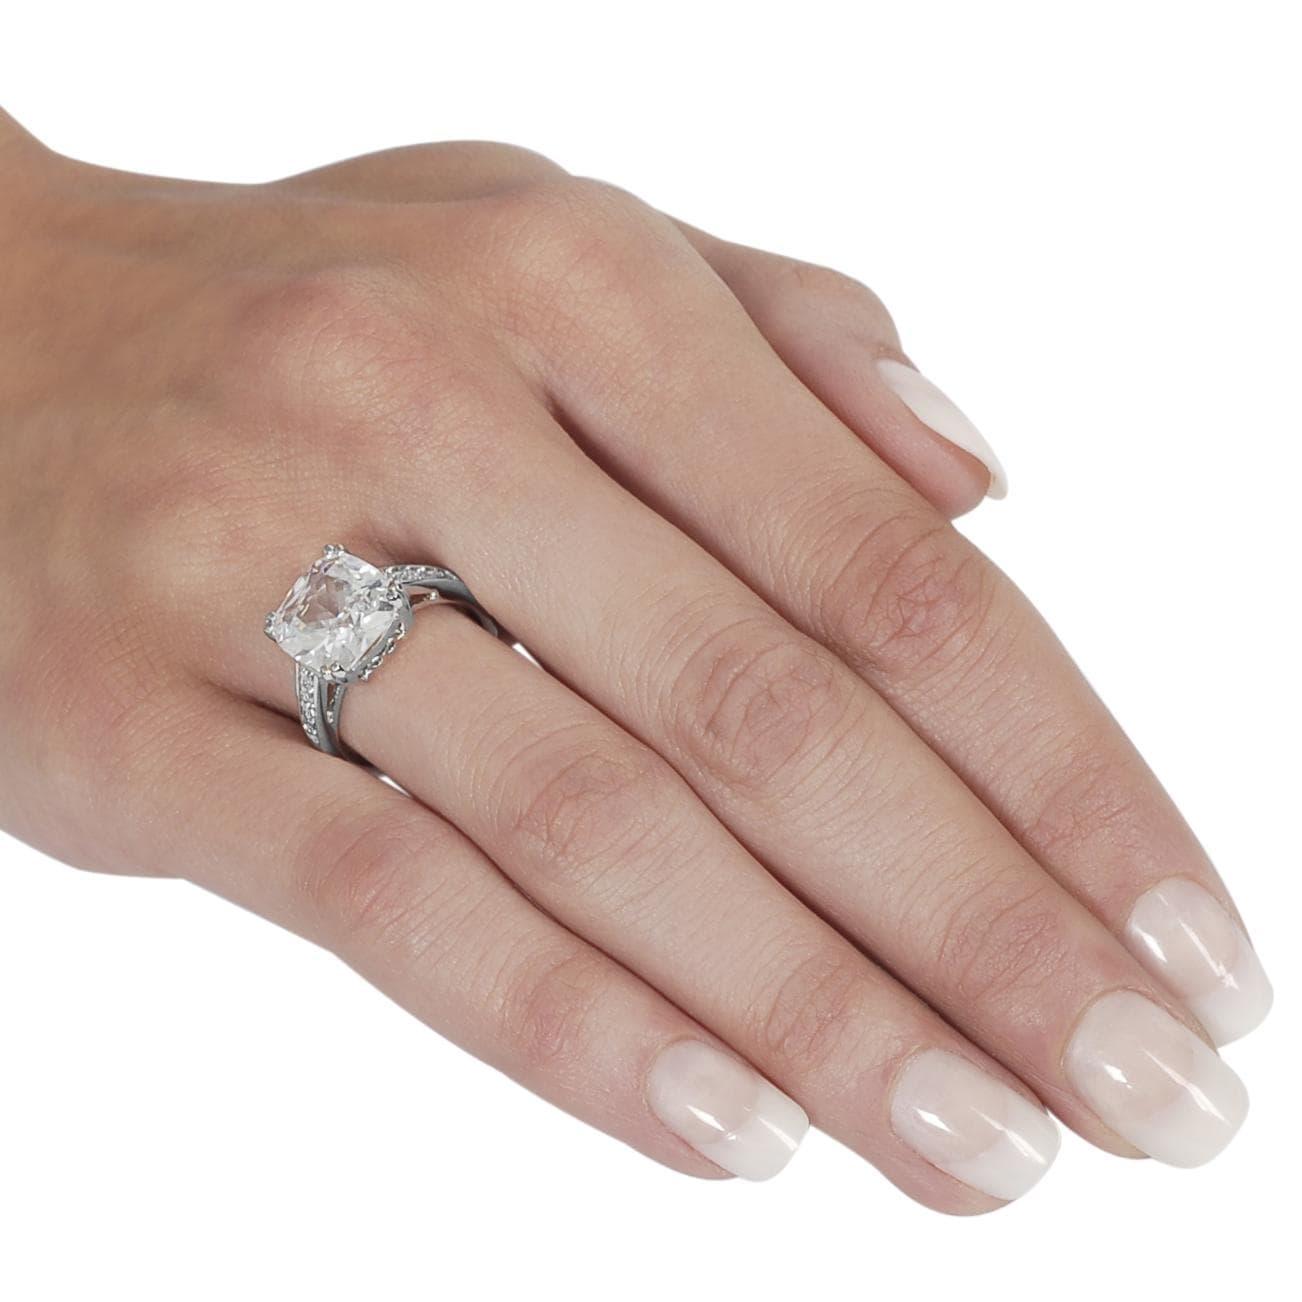 Journee Collection Silvertone Cushion-cut Cubic Zirconia Ring - Thumbnail 2